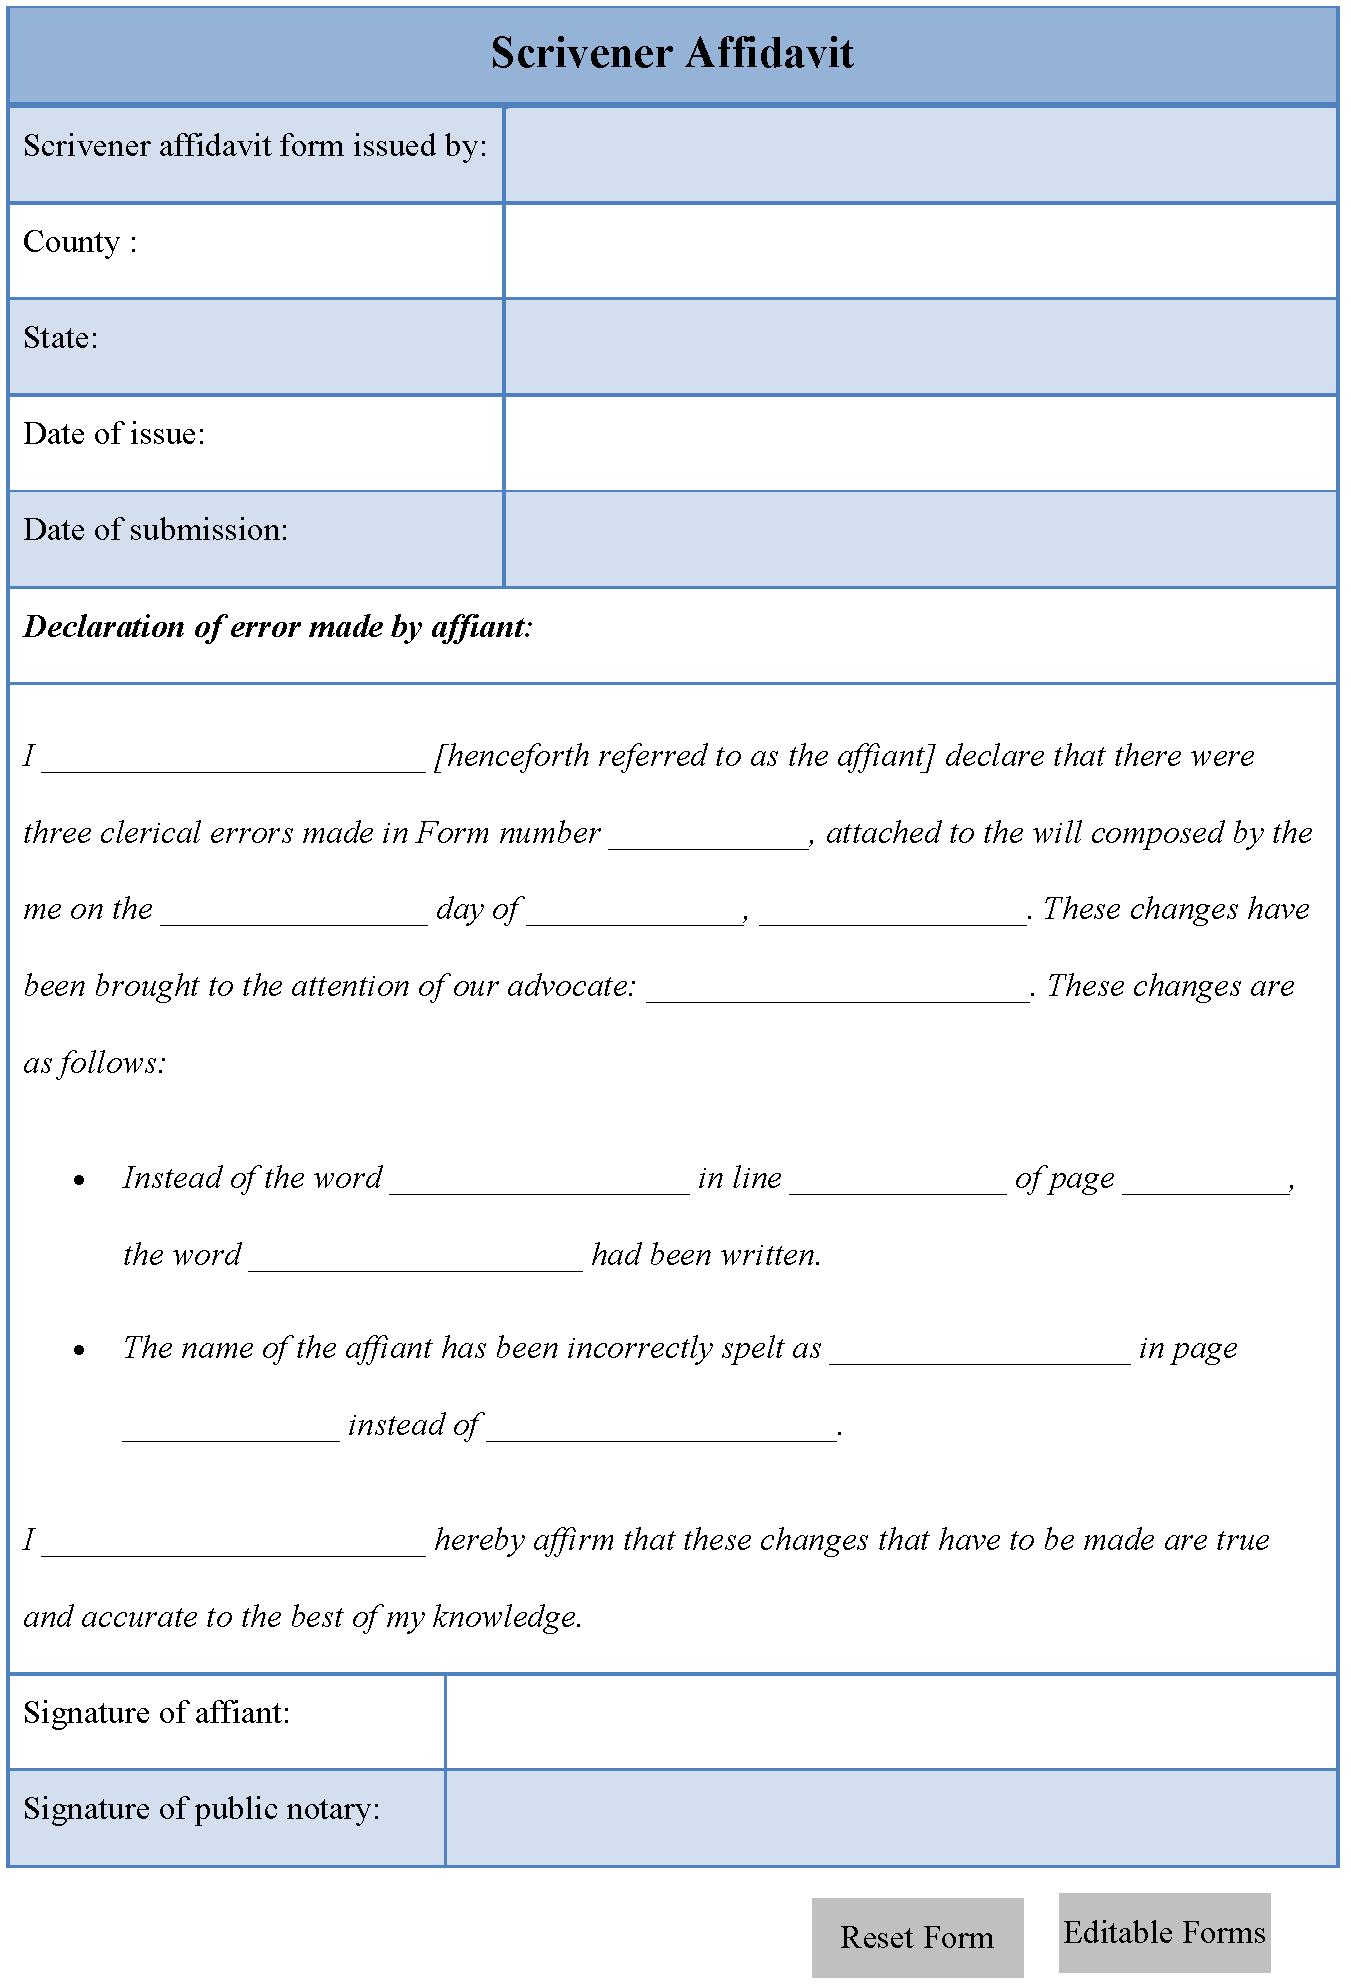 Scrivener Affidavit Form  Affadavit Form